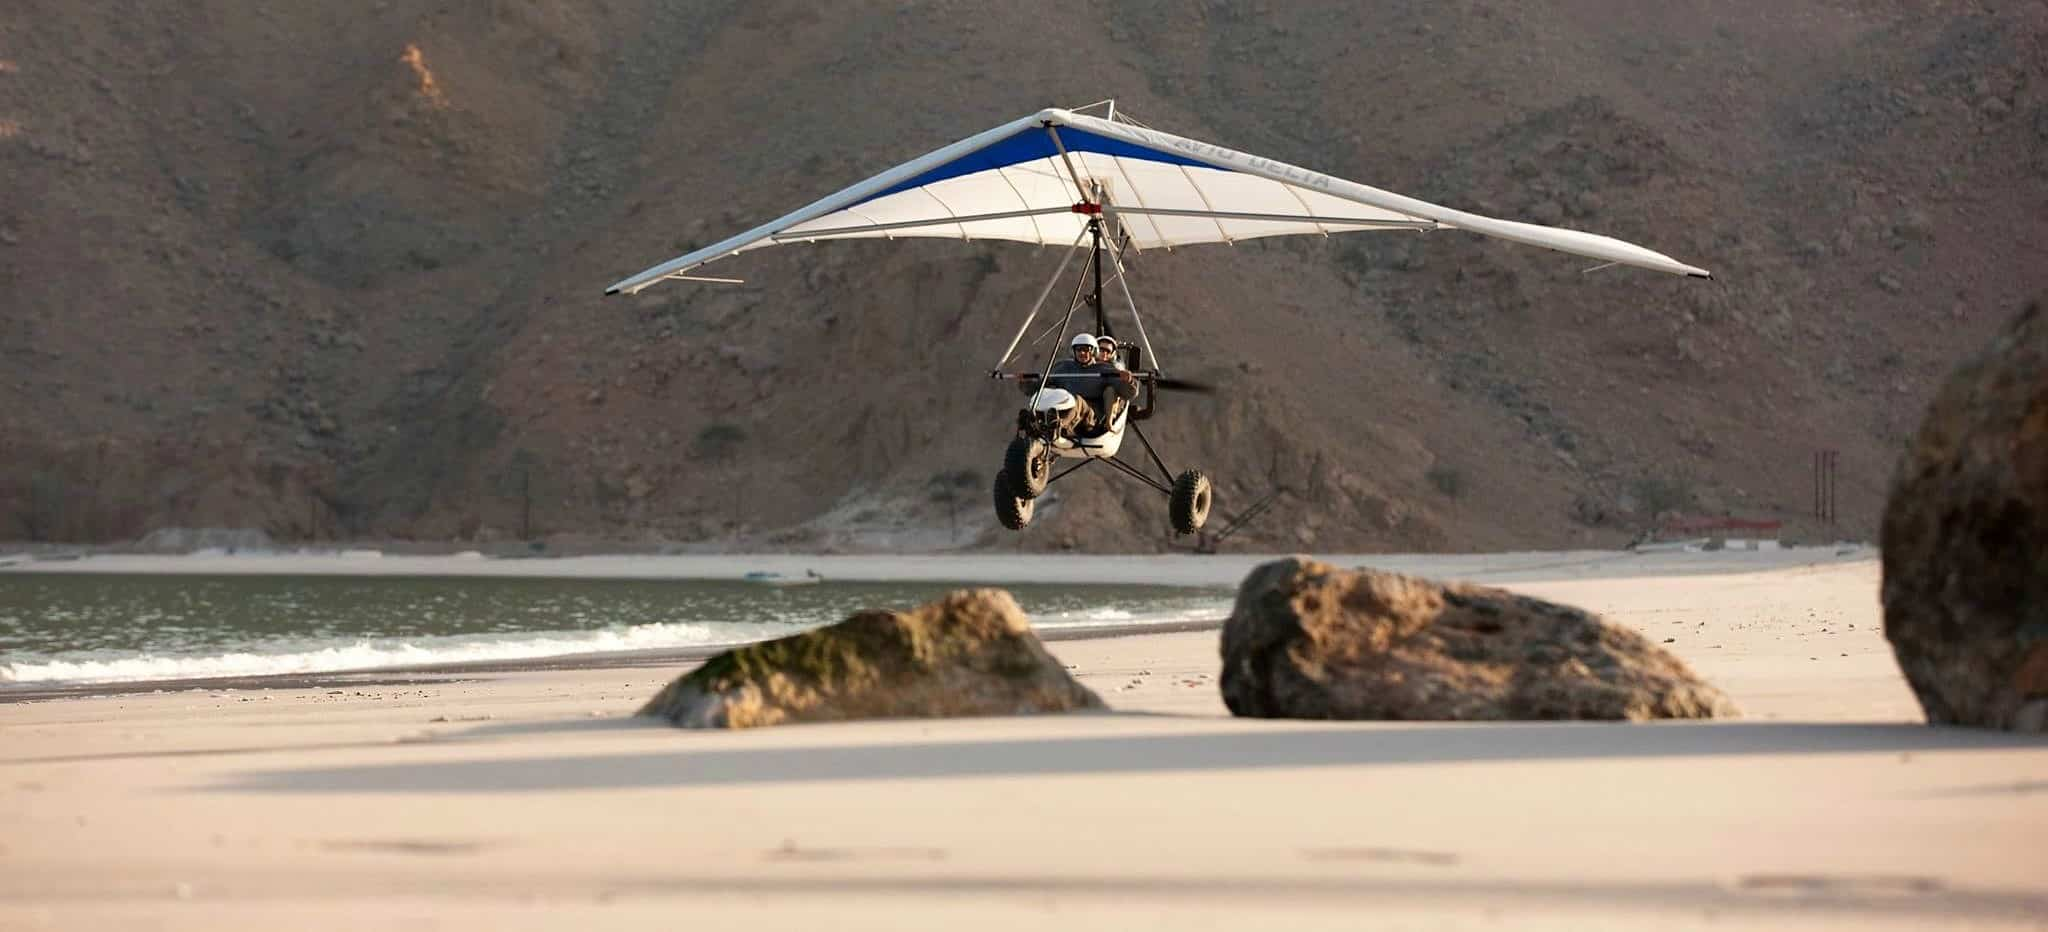 Microflight arrival into Six Senses Zighy Bay Oman